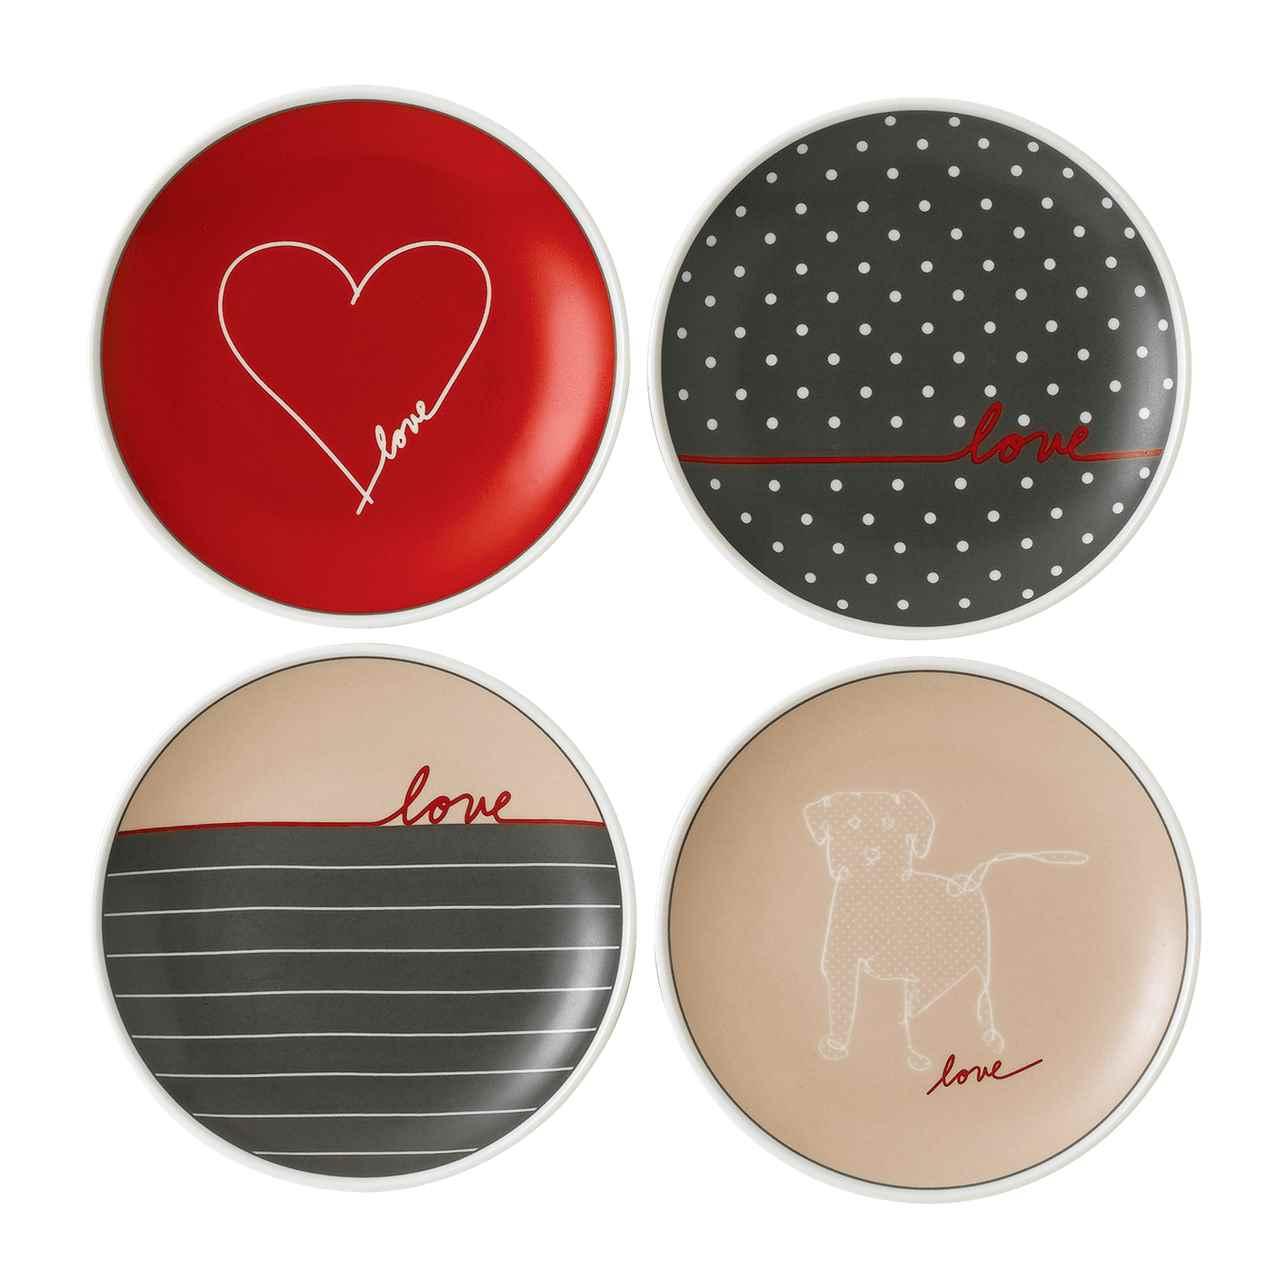 ED Love Signature Accent Plates (Set of 4)